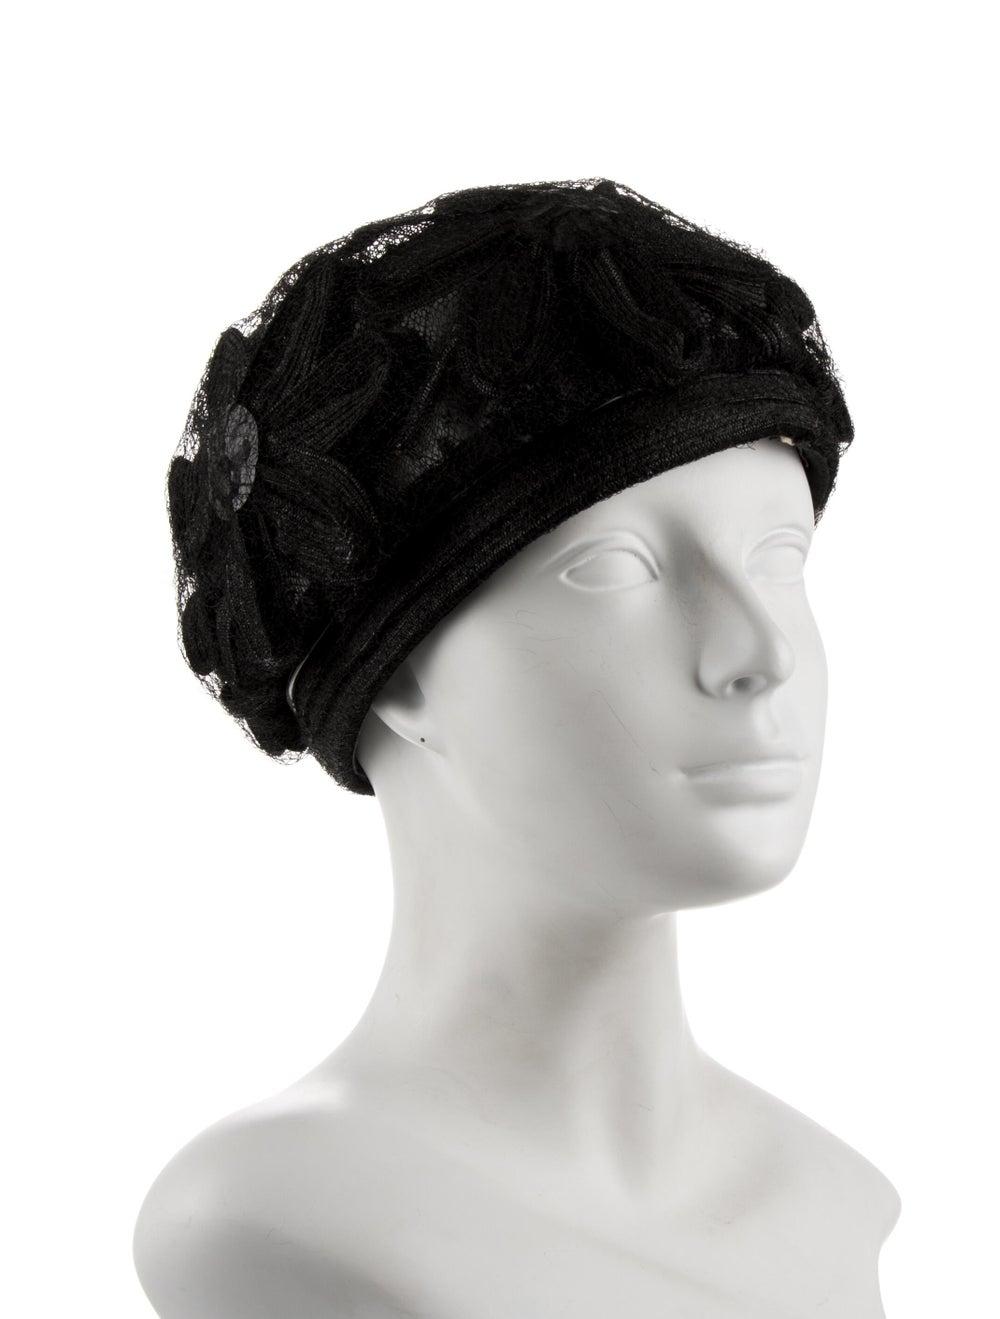 Christian Dior Lace Hat Black - image 3